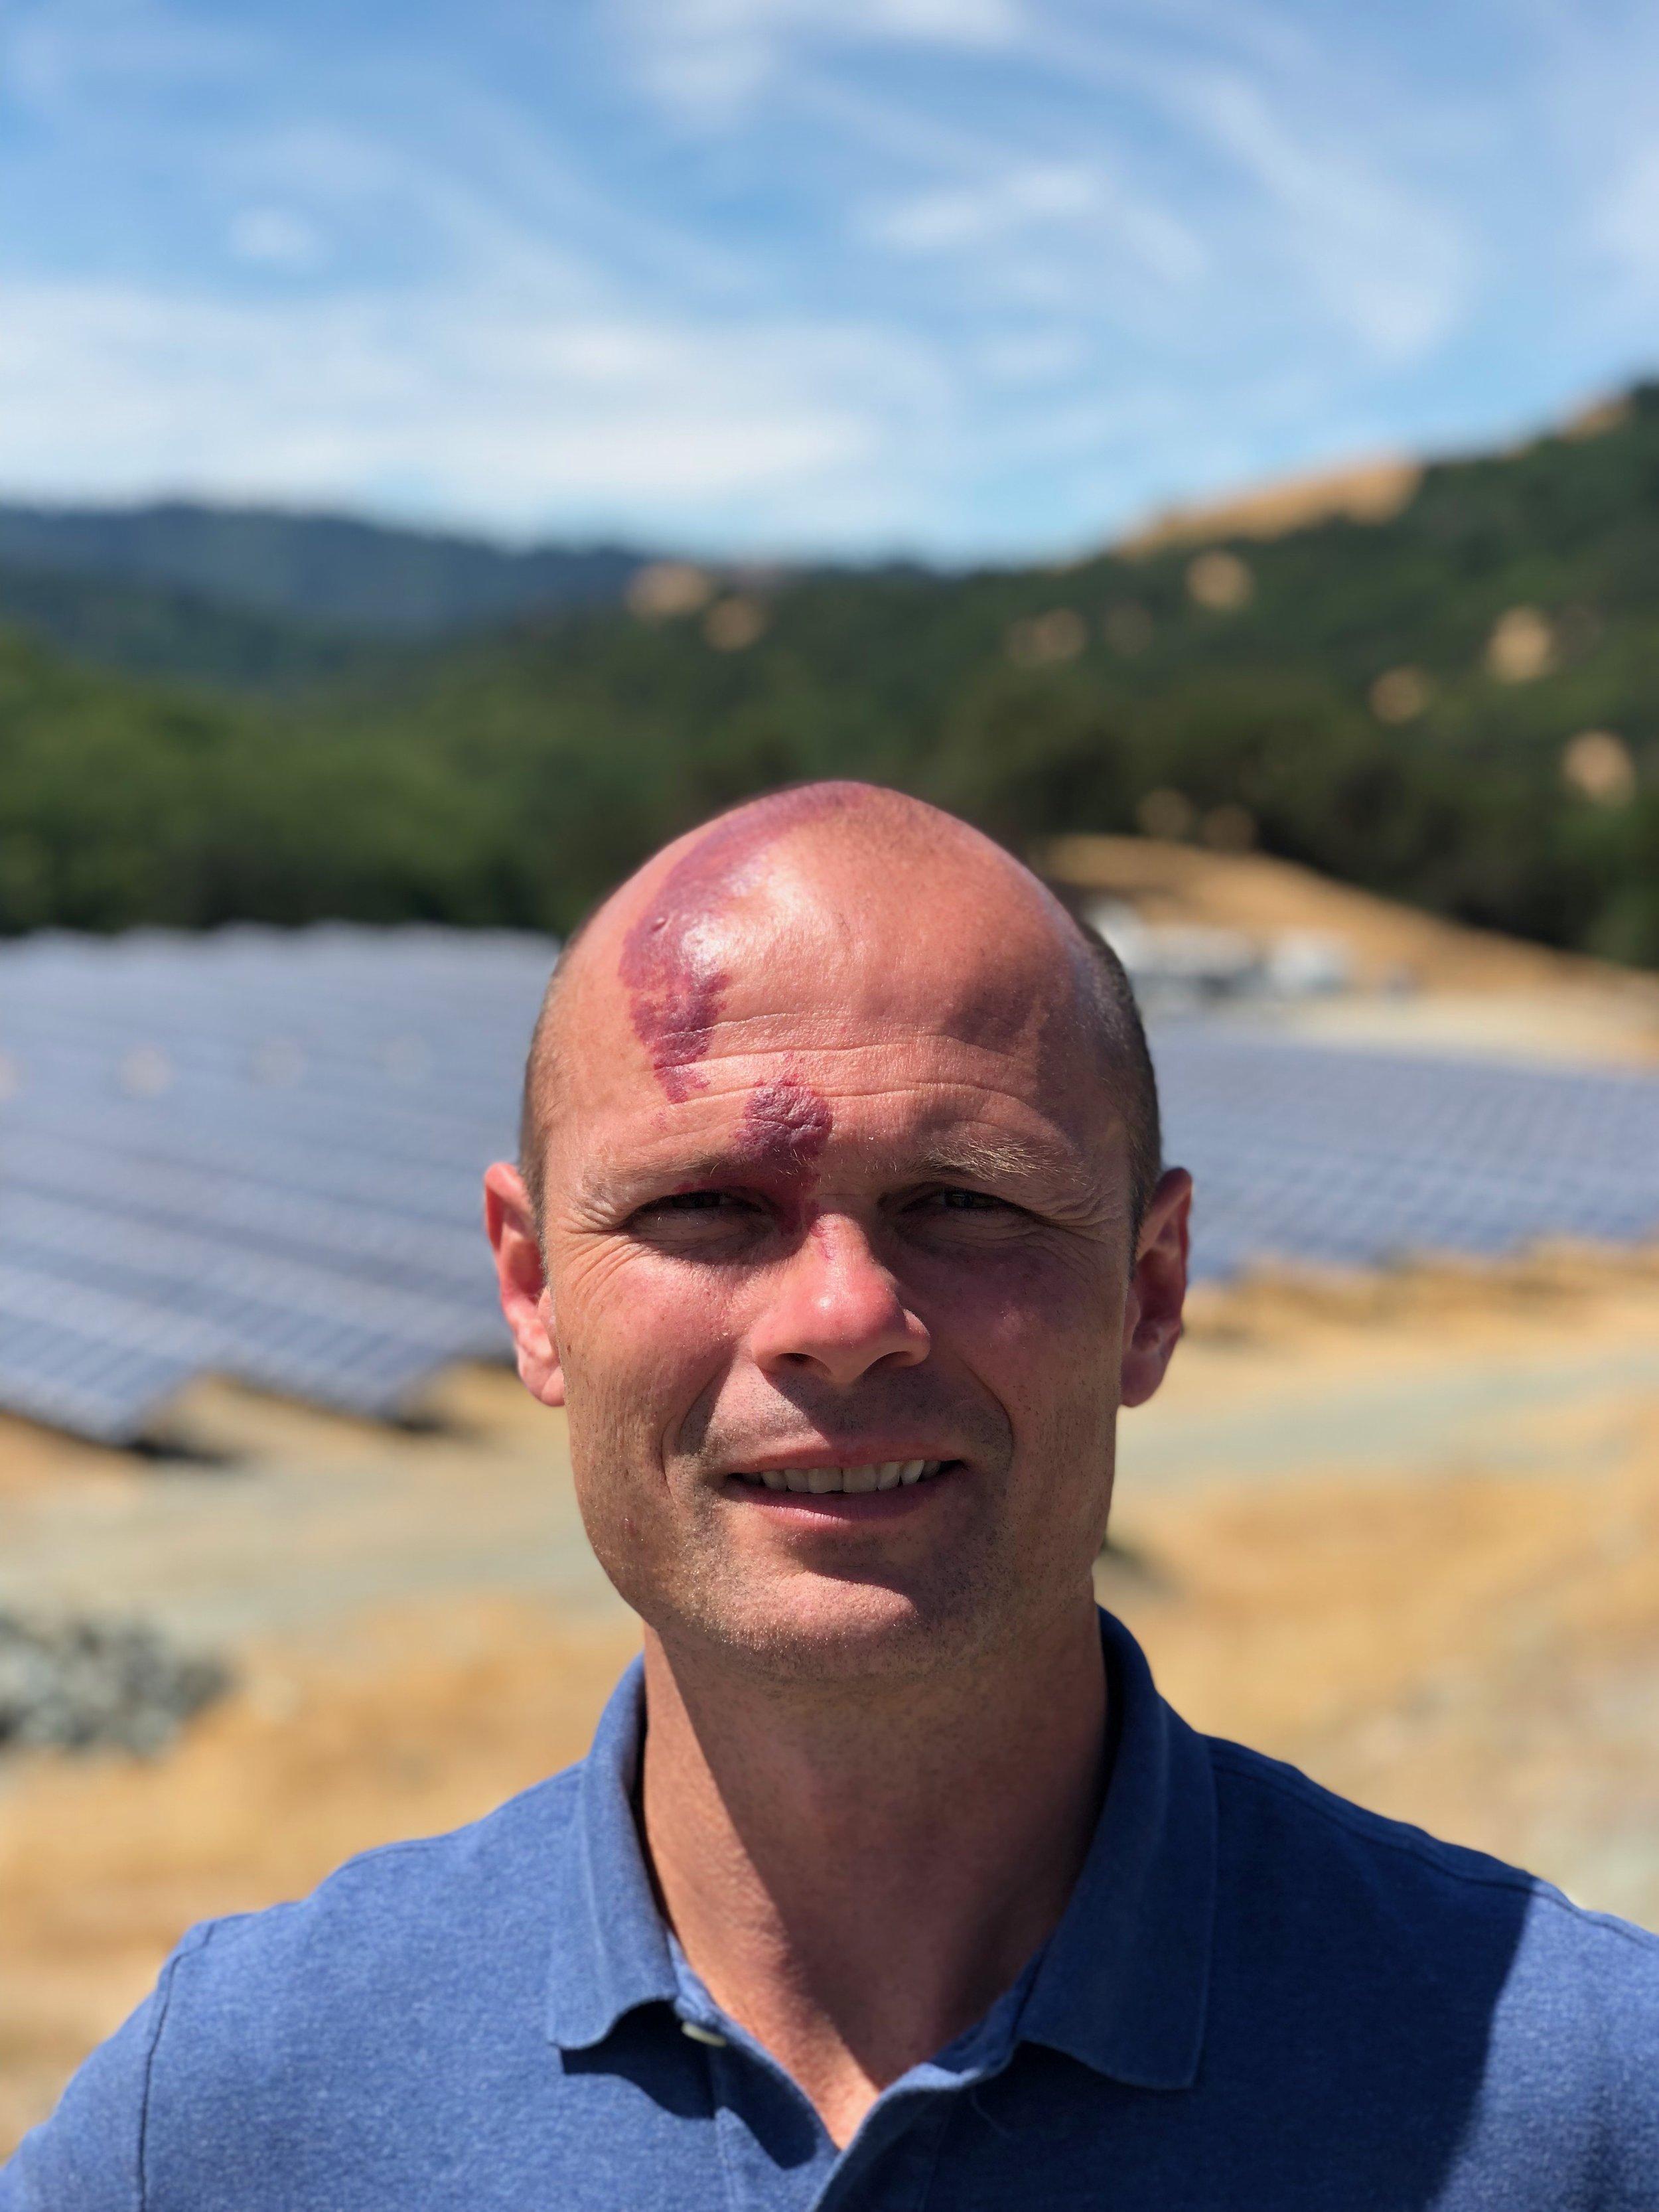 2018-07-13 Ben at Solar panels.jpg